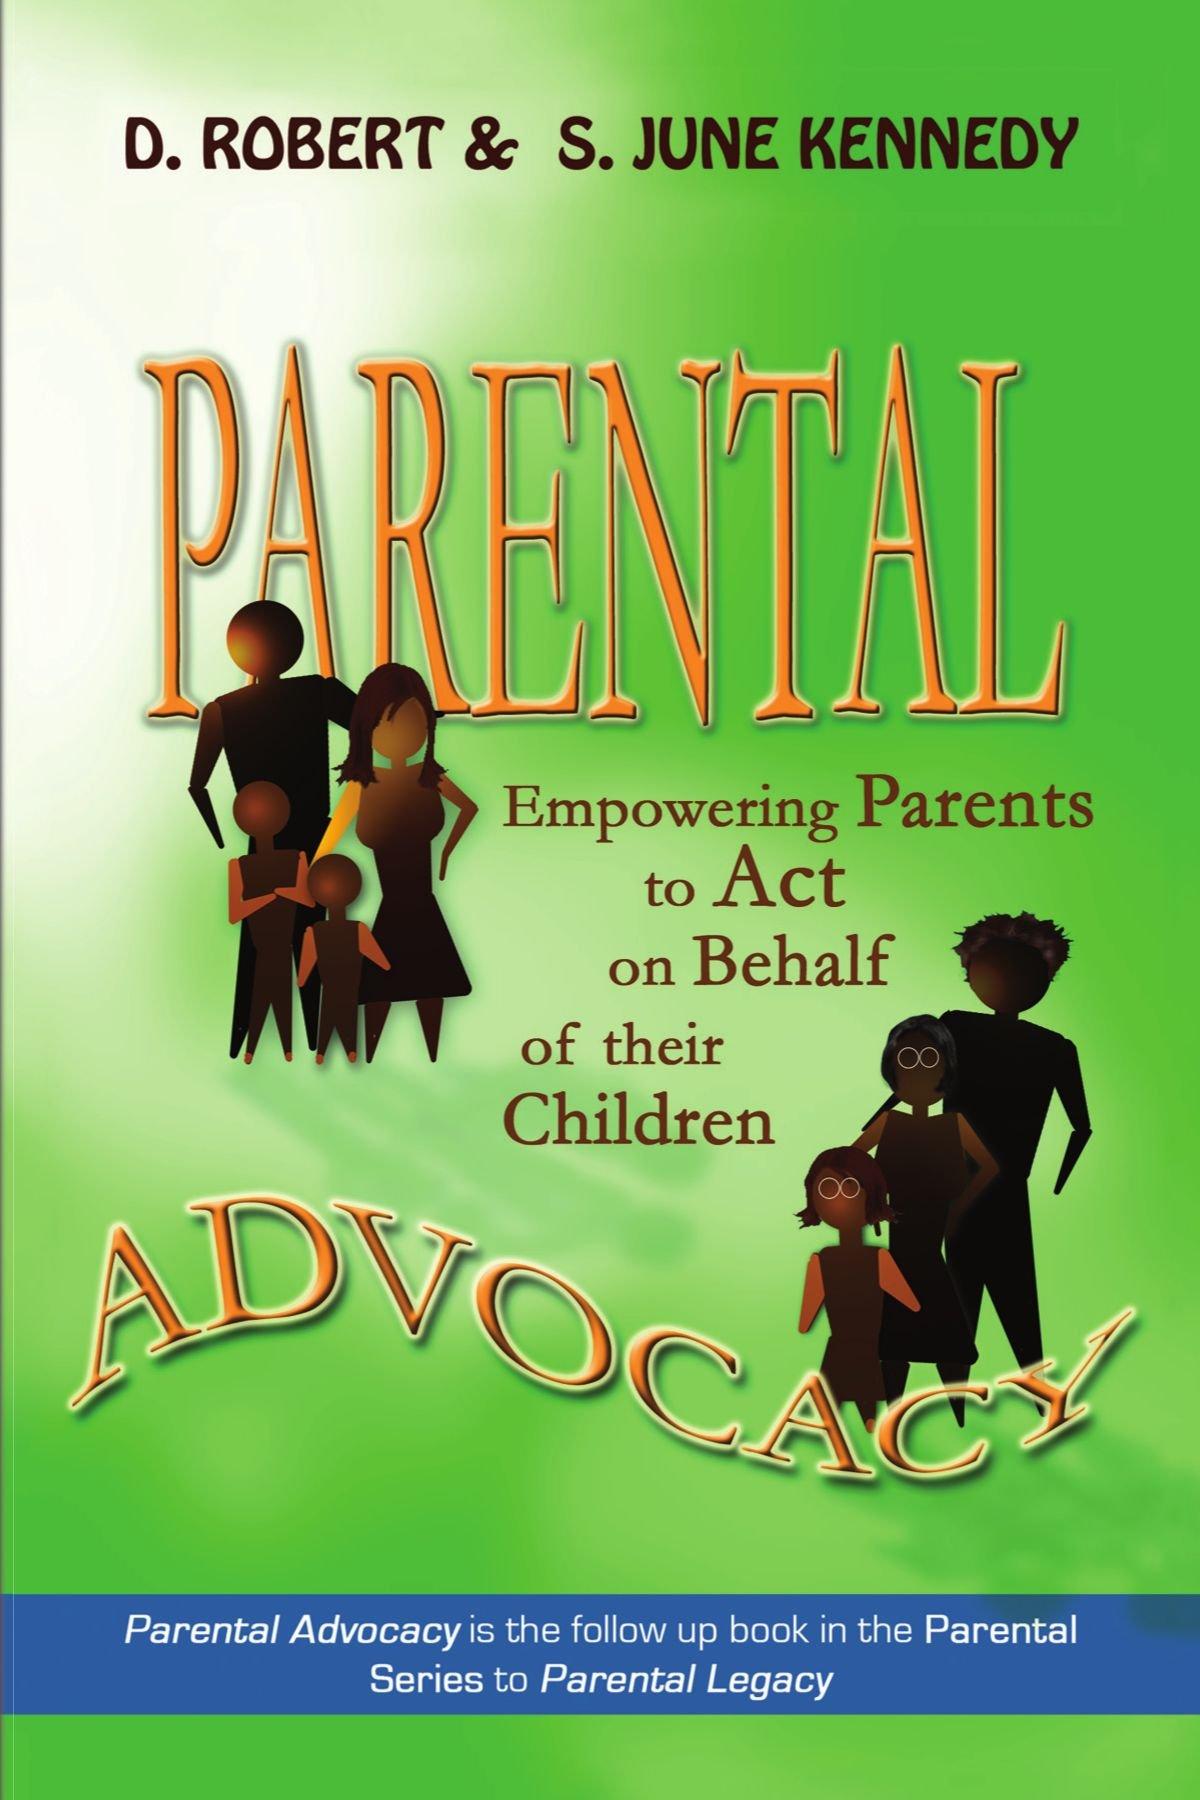 Read Online PARENTAL ADVOCACY: Empowering Parents to Act on Behalf of their Children pdf epub